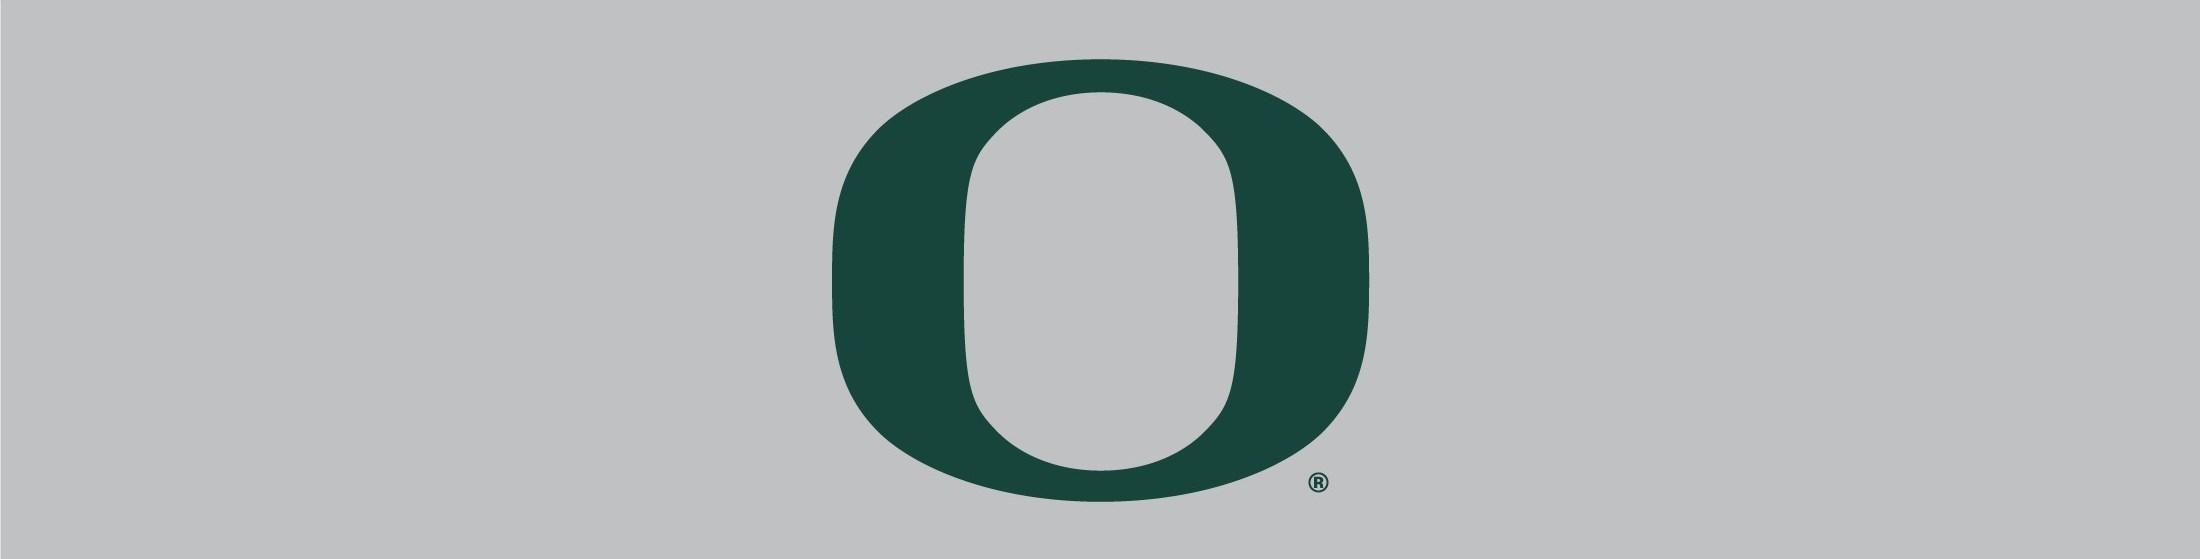 Oregon Ducks Vs Georgia State Panthers Replybuy